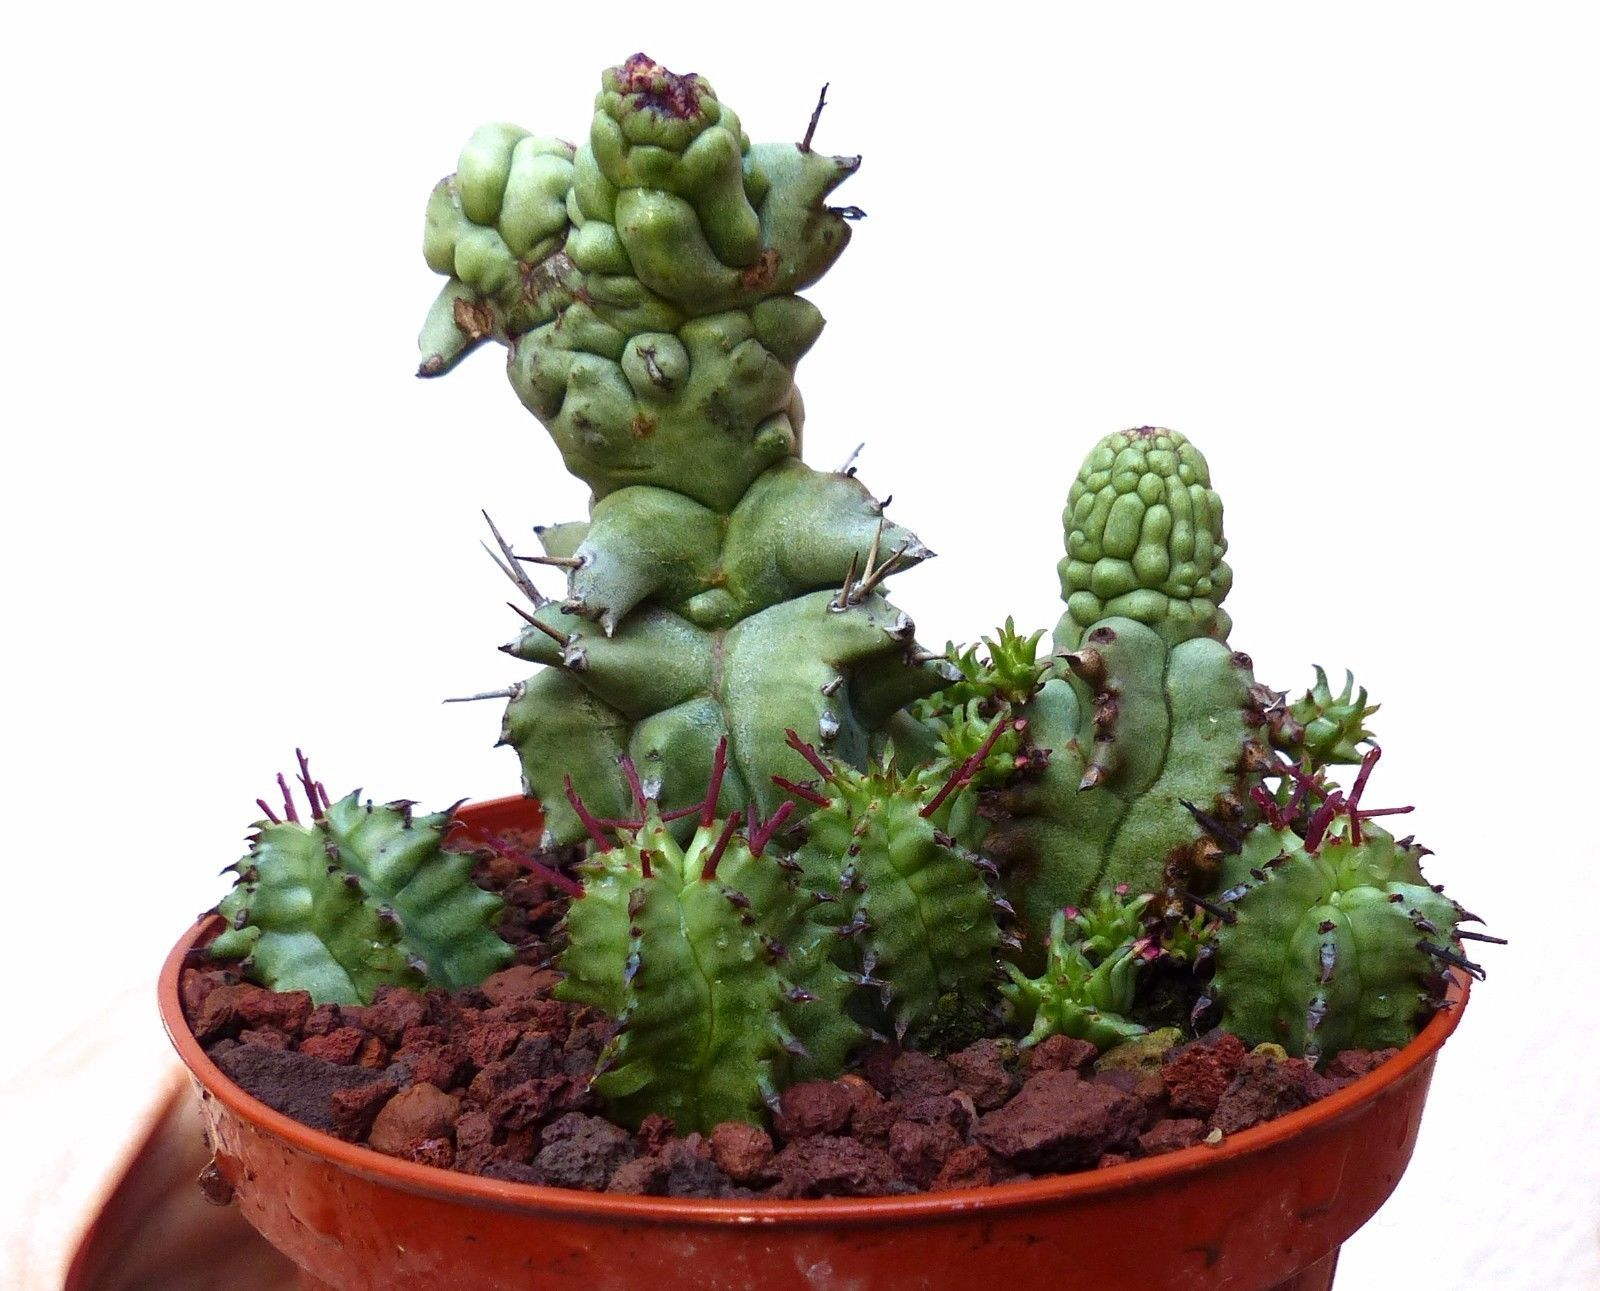 cluster EUPHORBIA HORRIDA monstruosus form KIKKO (chimera) no crested obesa 27R | Garden & Patio, Plants, Seeds & Bulbs, Plants & Seedlings | eBay!